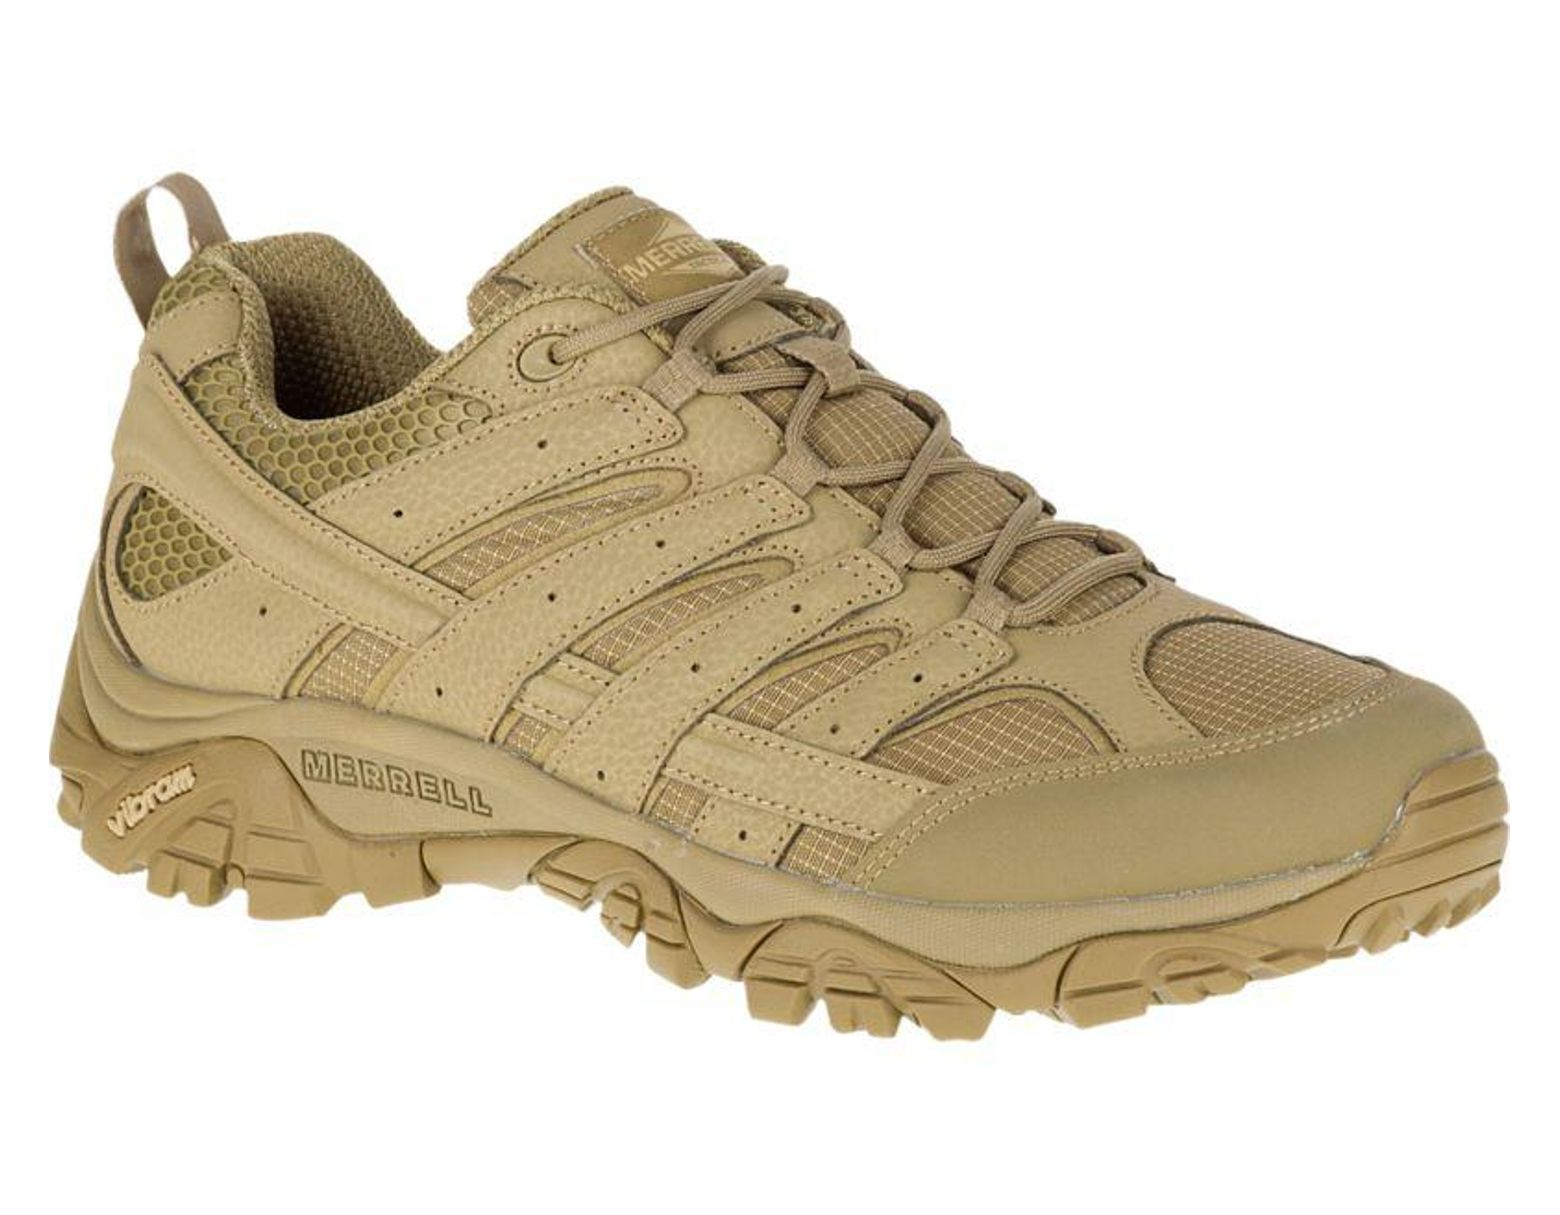 fc1a5e8e Men's Moab 2 Tactical Shoe Wide